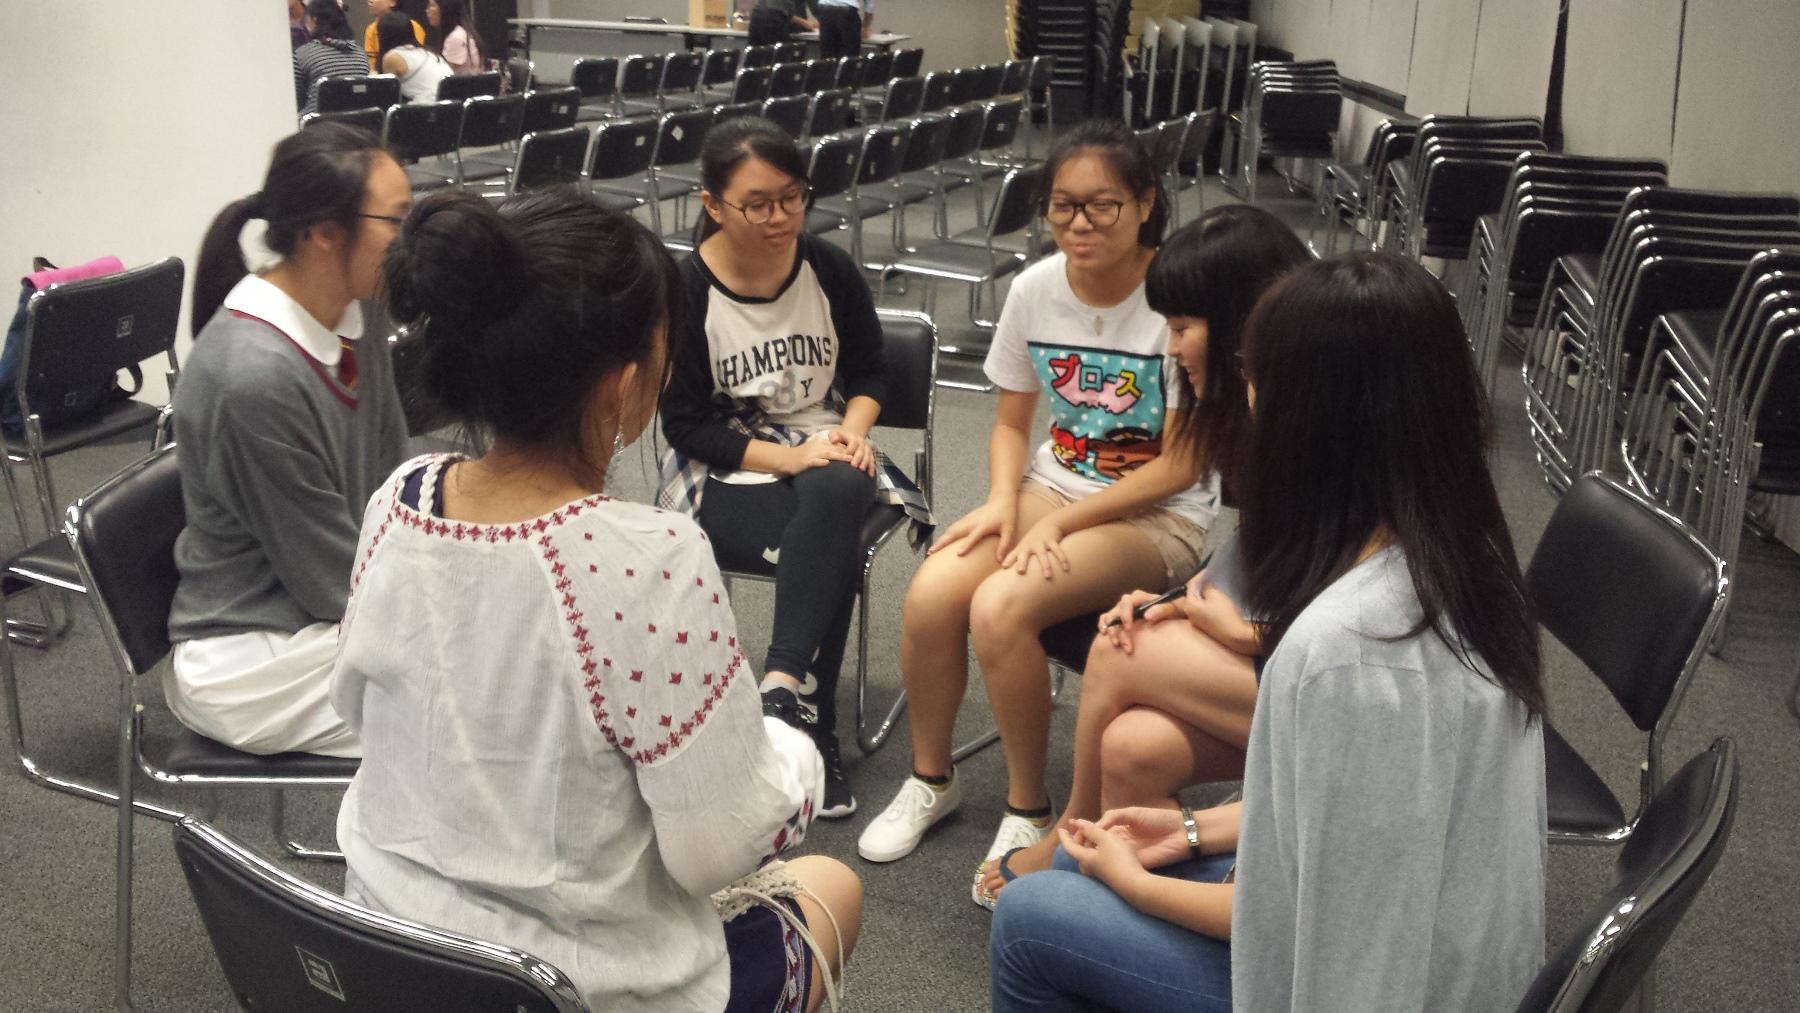 http://www.npc.edu.hk/sites/default/files/20170706_192842.jpg